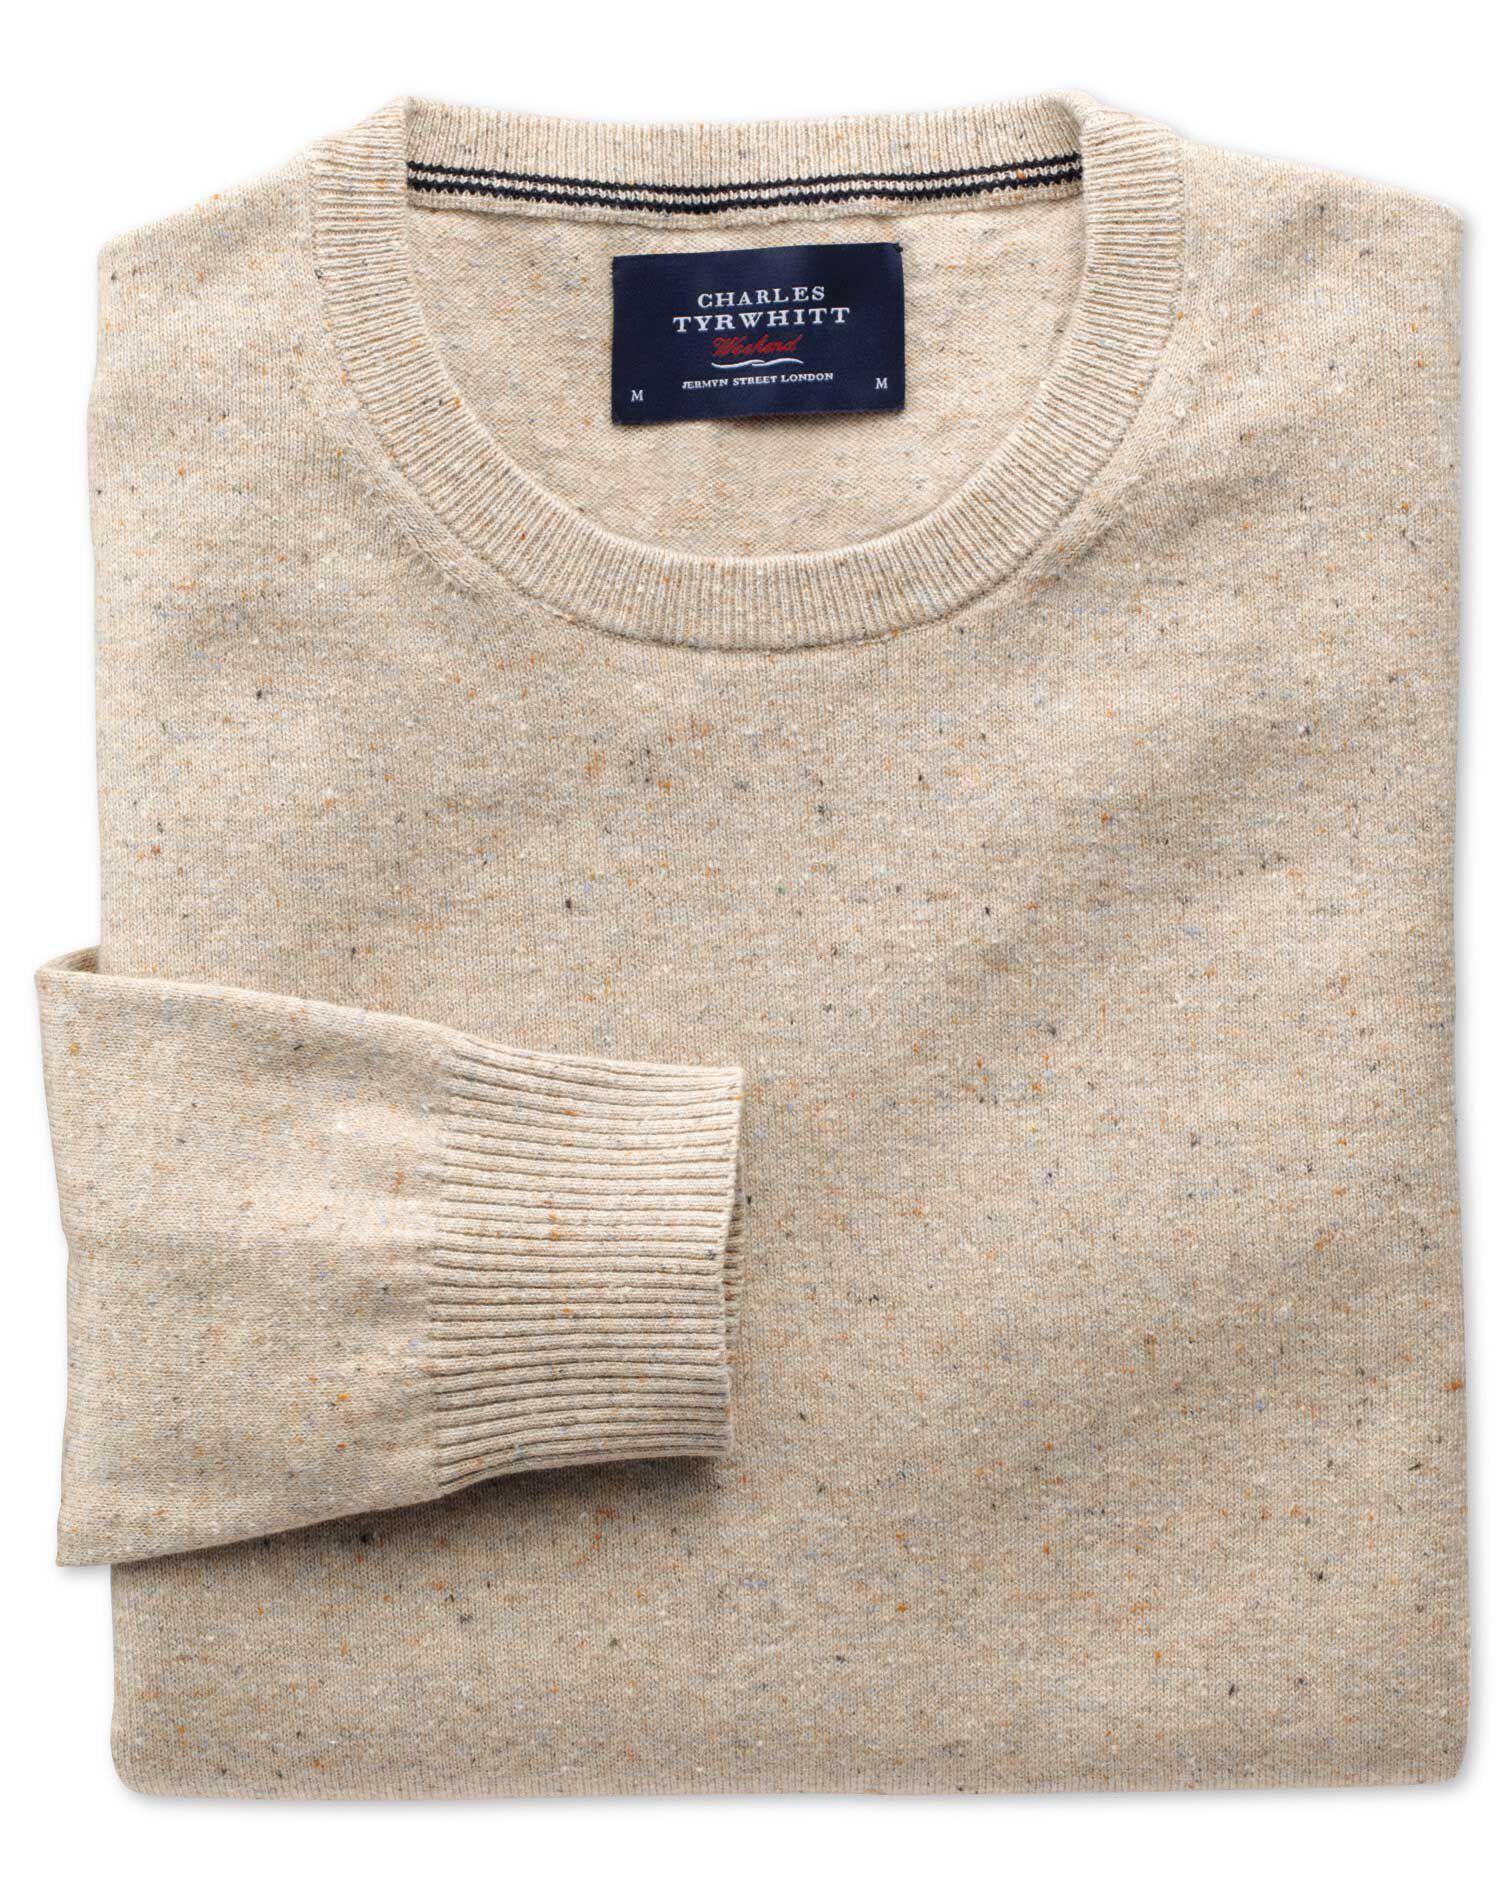 Stone Cotton Cashmere Crew Neck Jumper Size XXXL by Charles Tyrwhitt